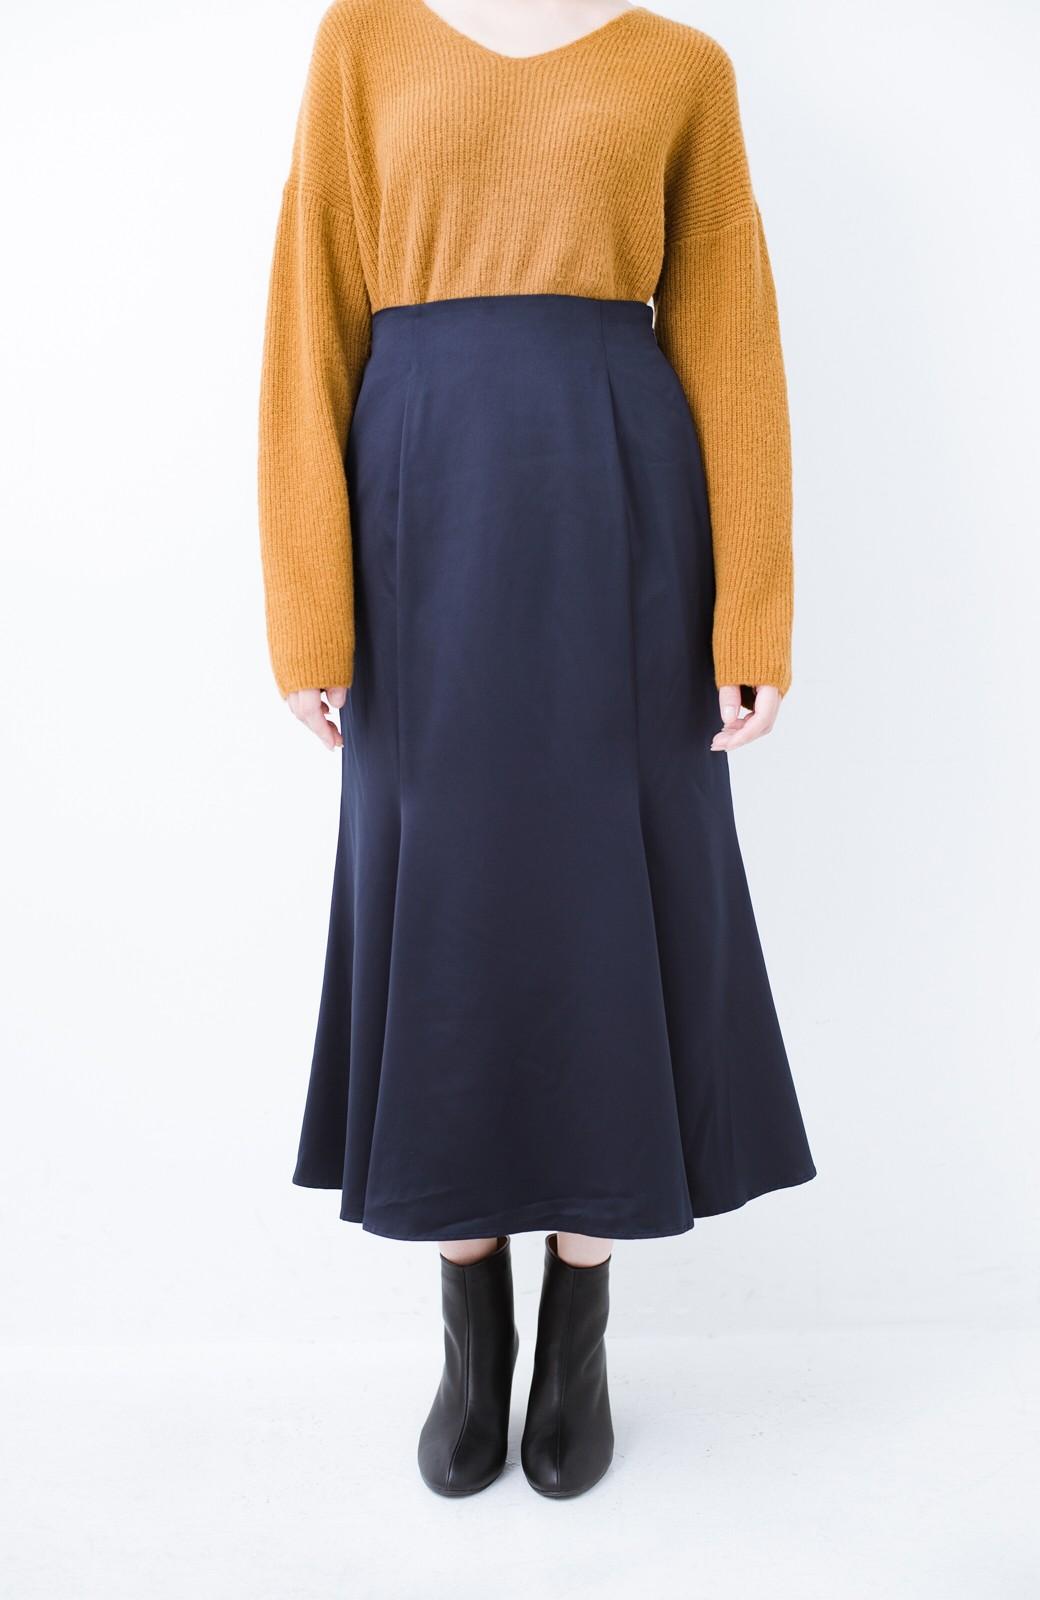 haco! スウェットやスニーカーを合わせても女っぽくいられるサテンマーメイドスカート by que made me <ネイビー>の商品写真5